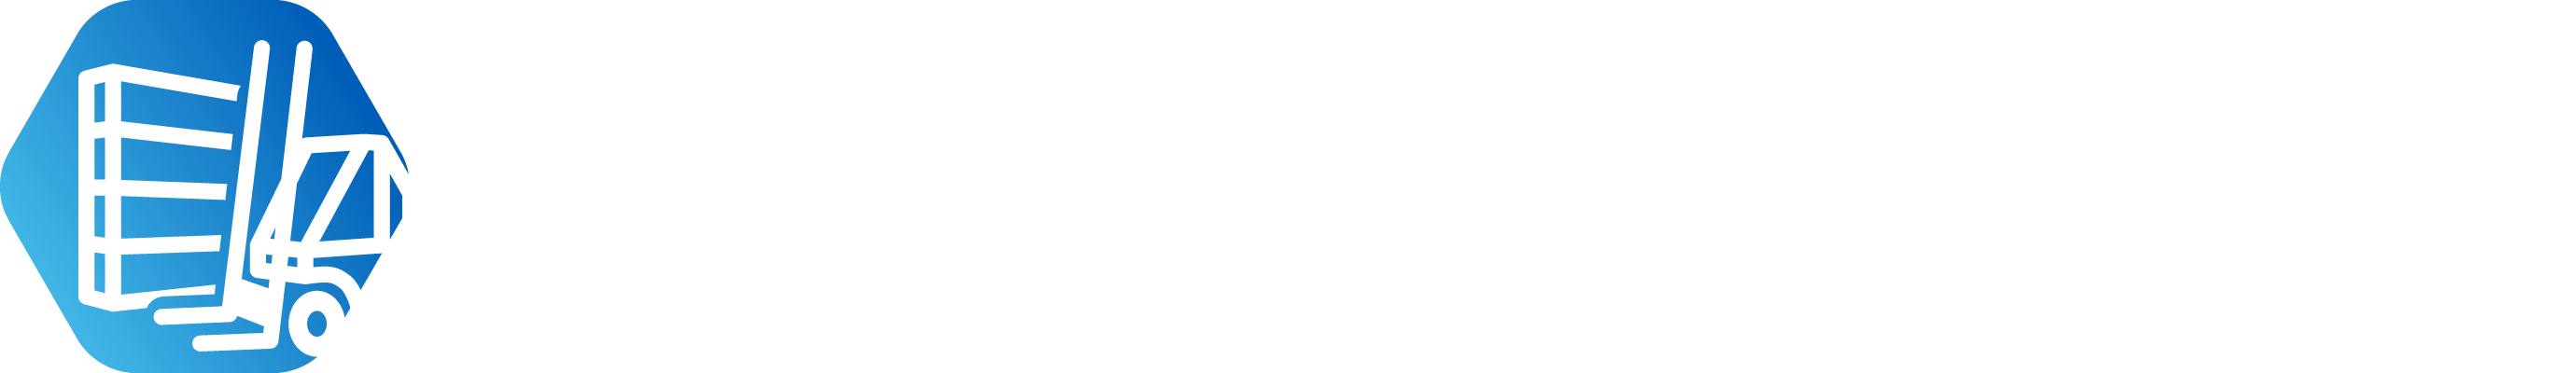 Logo_STATCONTROL_RGB_white